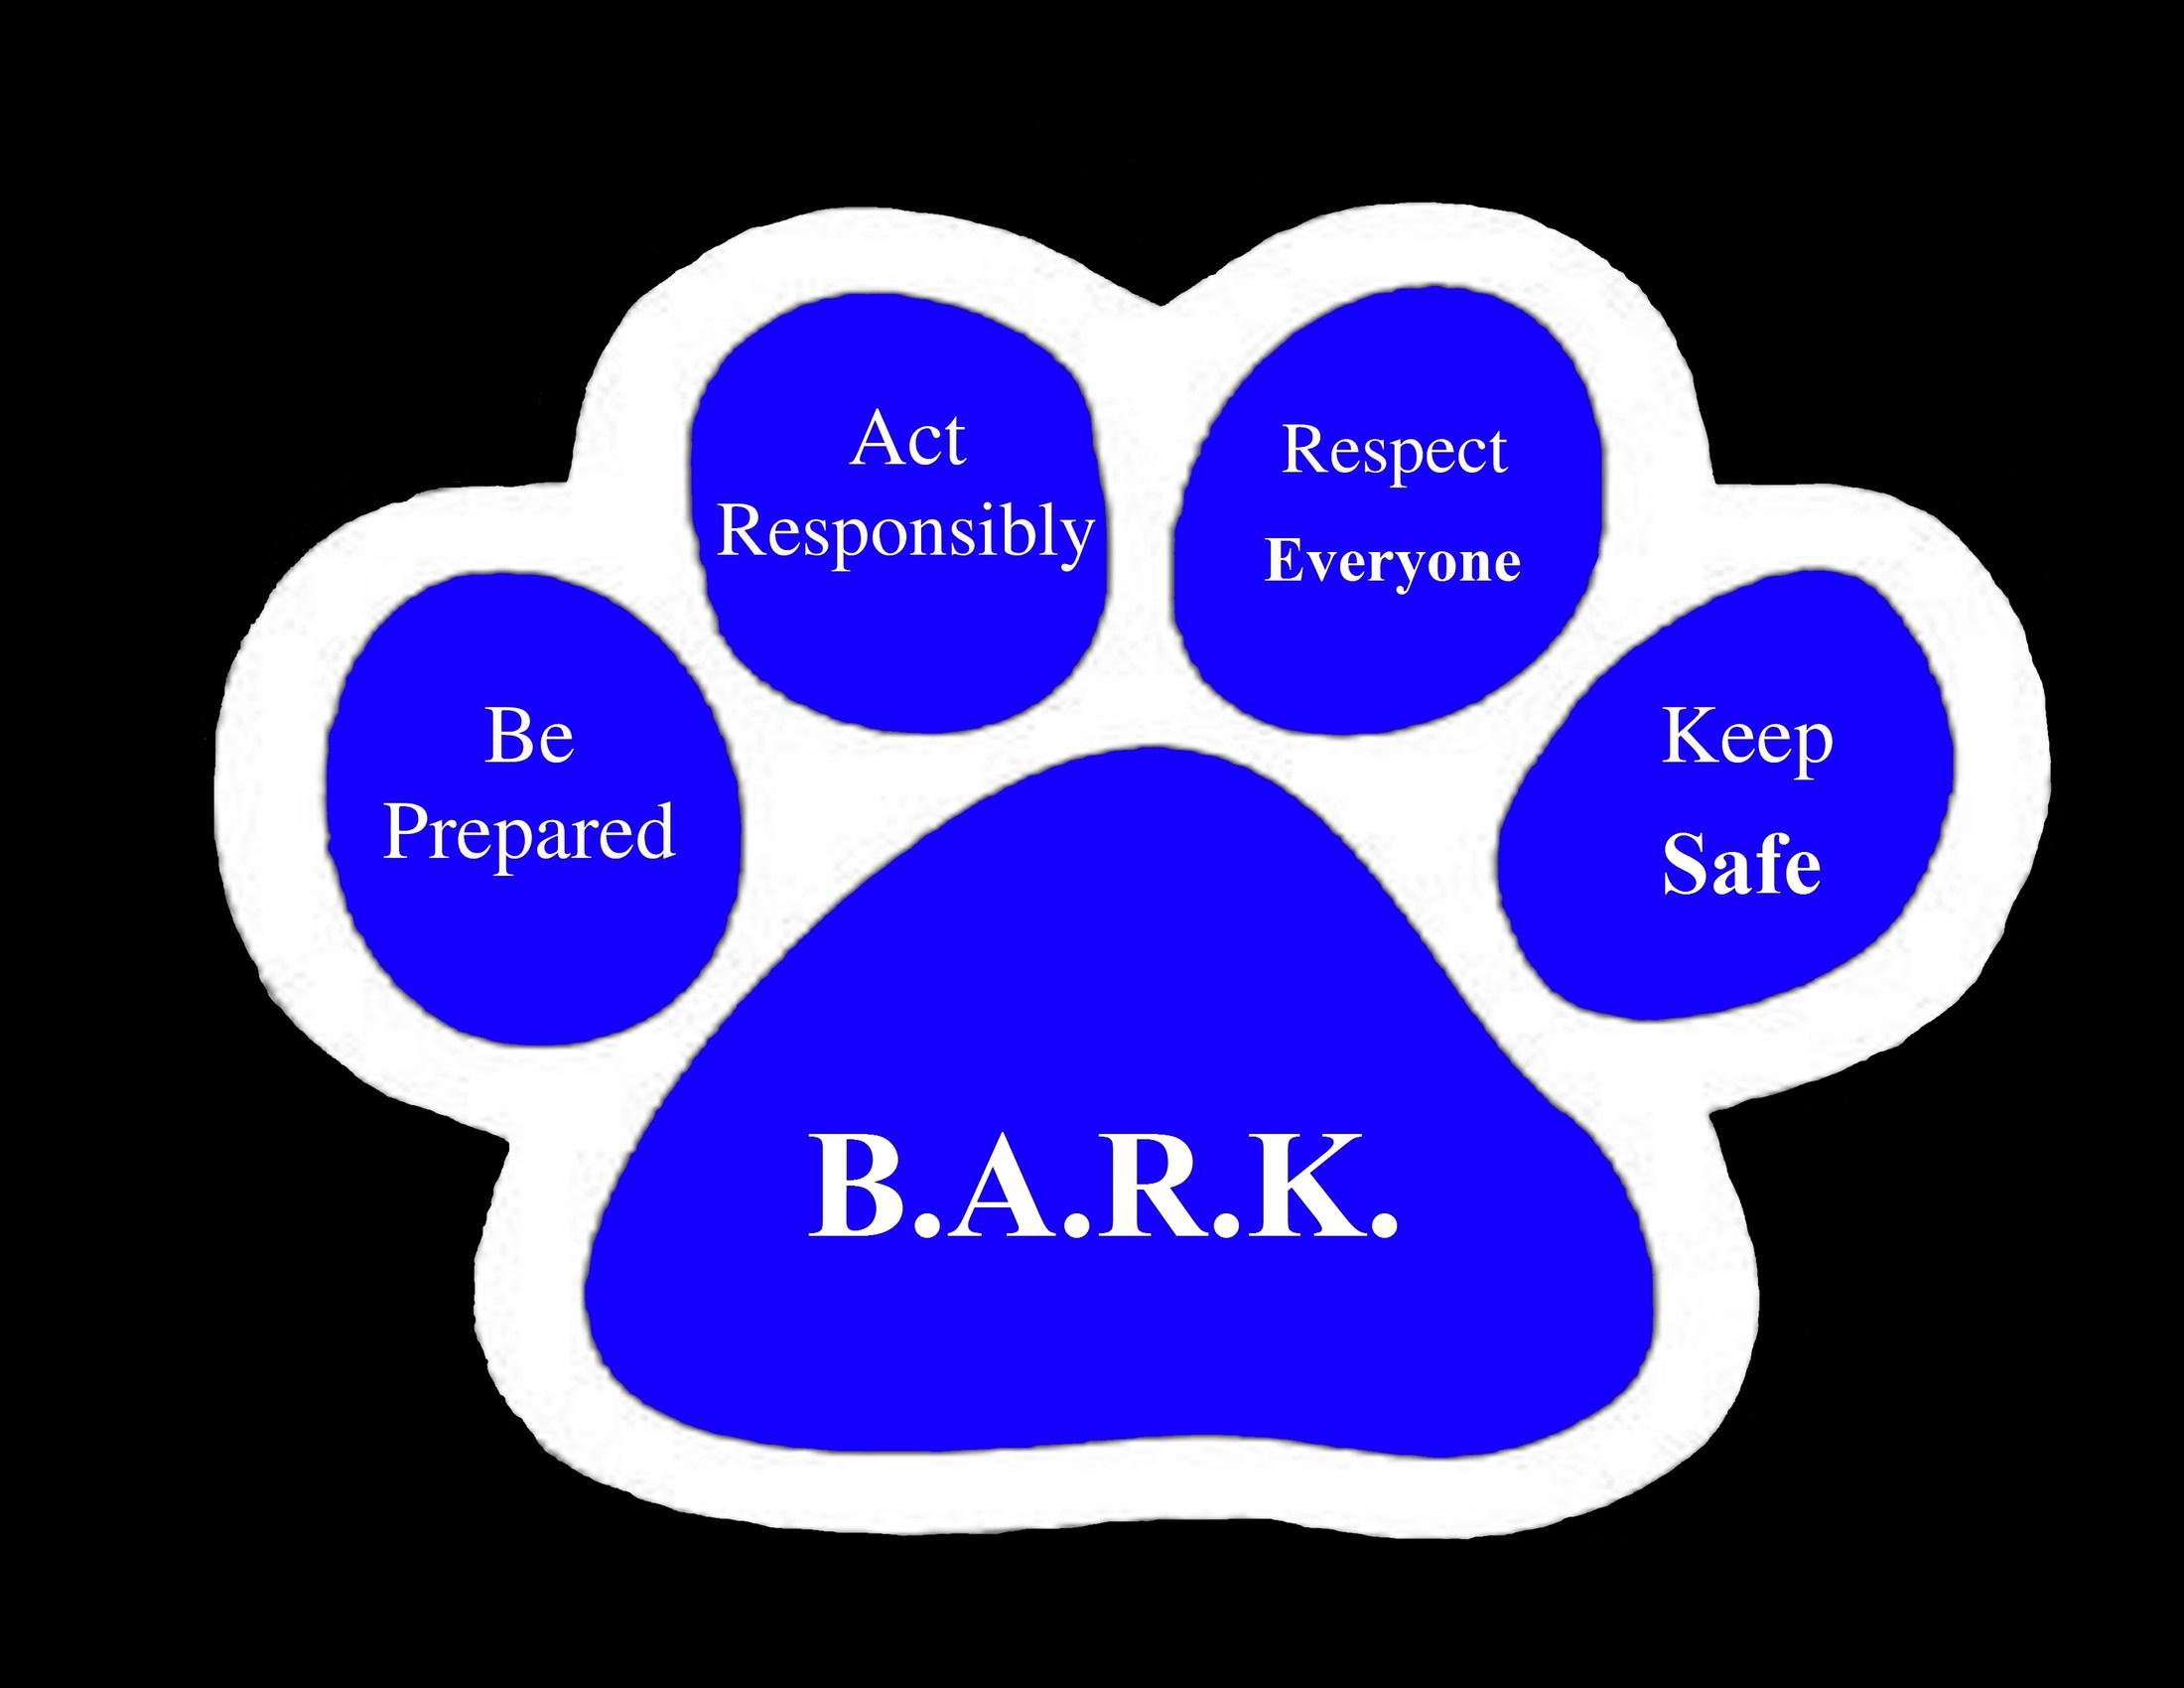 B.A.R.K. Motto